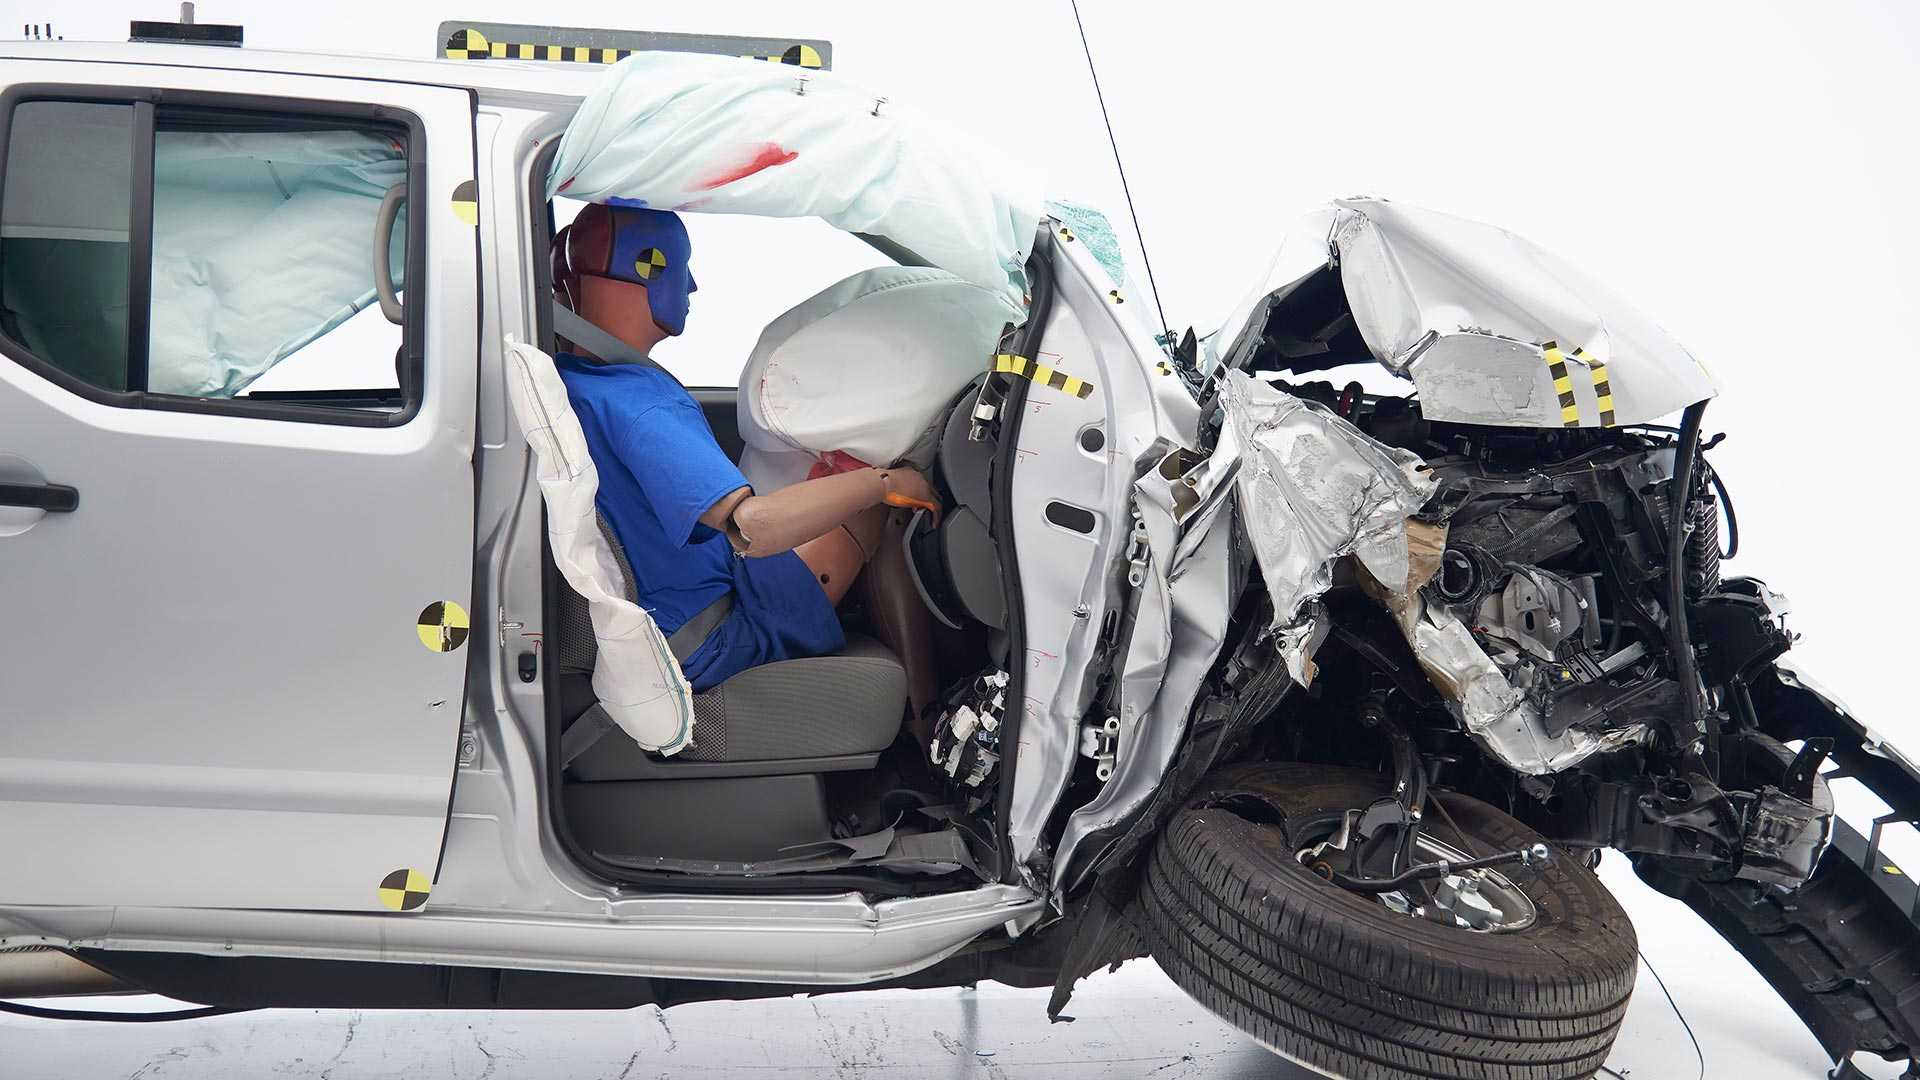 2019-nissan-frontier-crew-cab-crash-test (2)